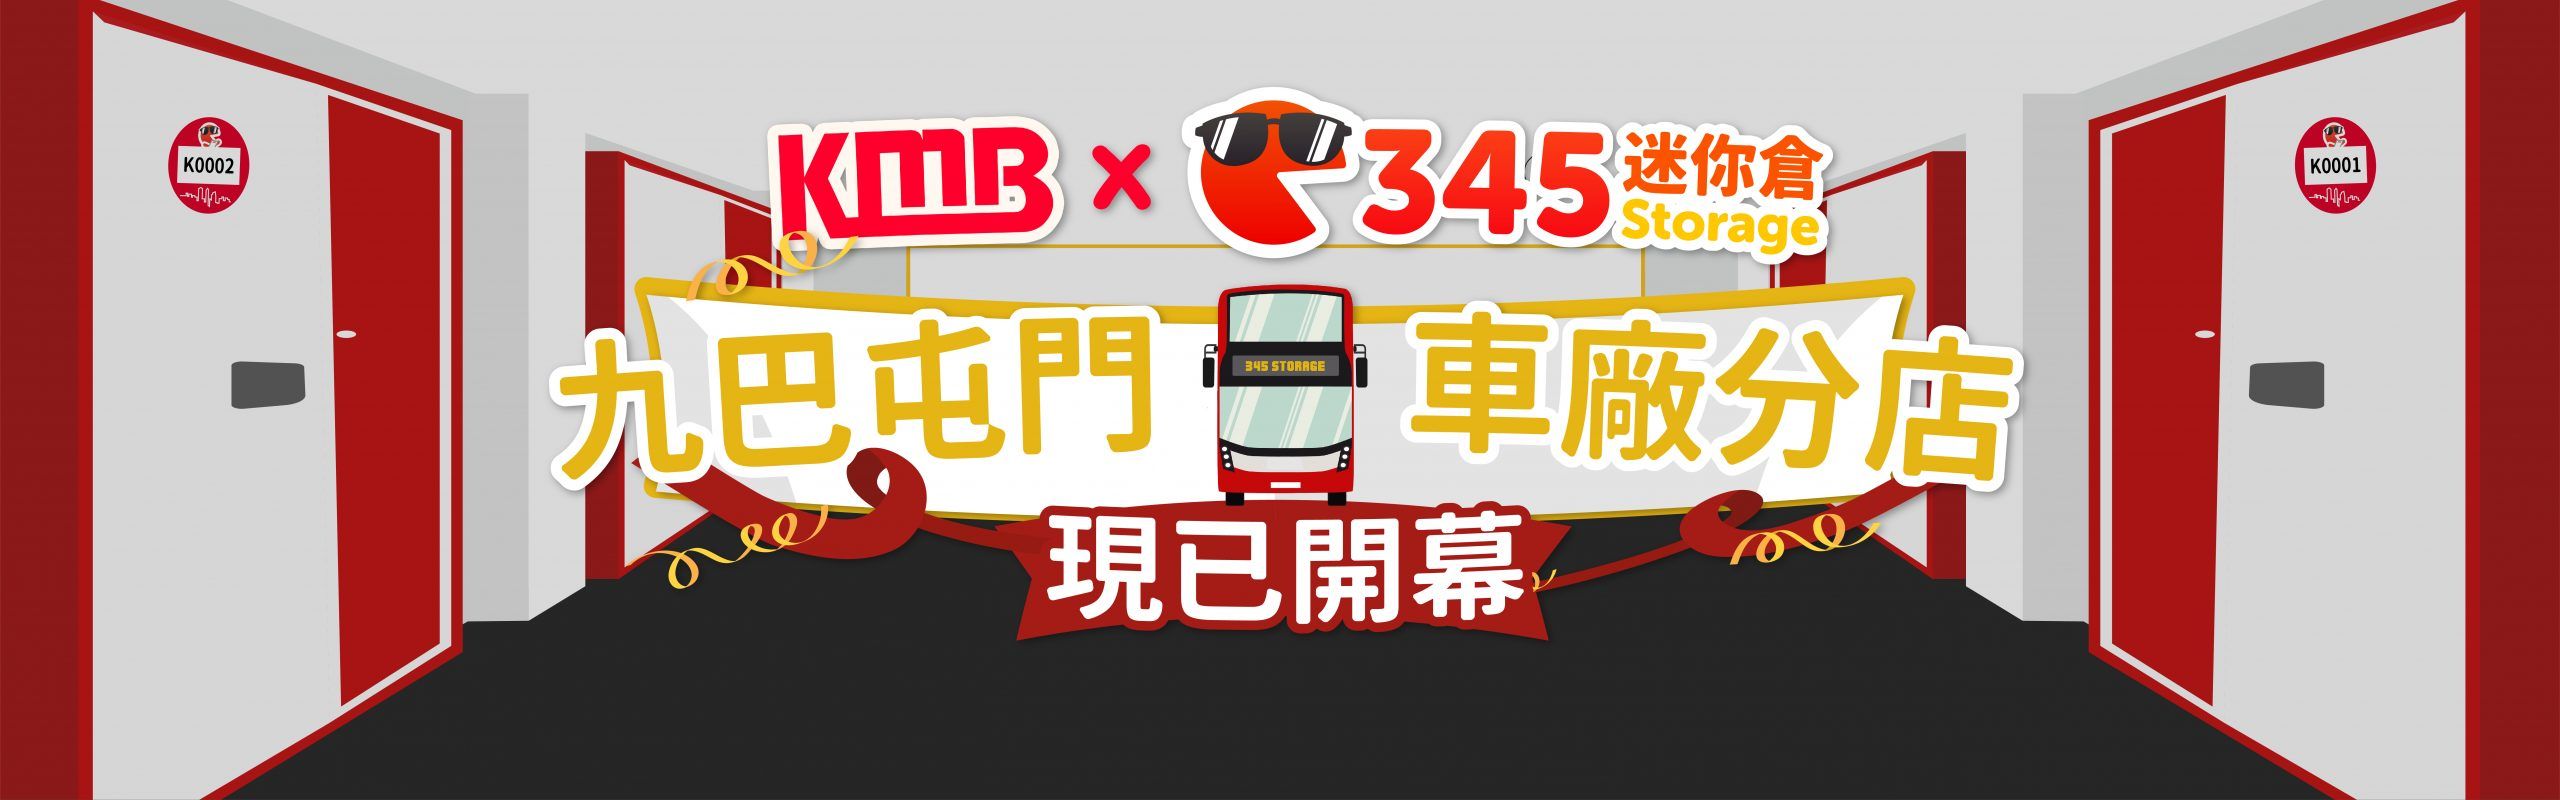 Web KMB BANNER -01